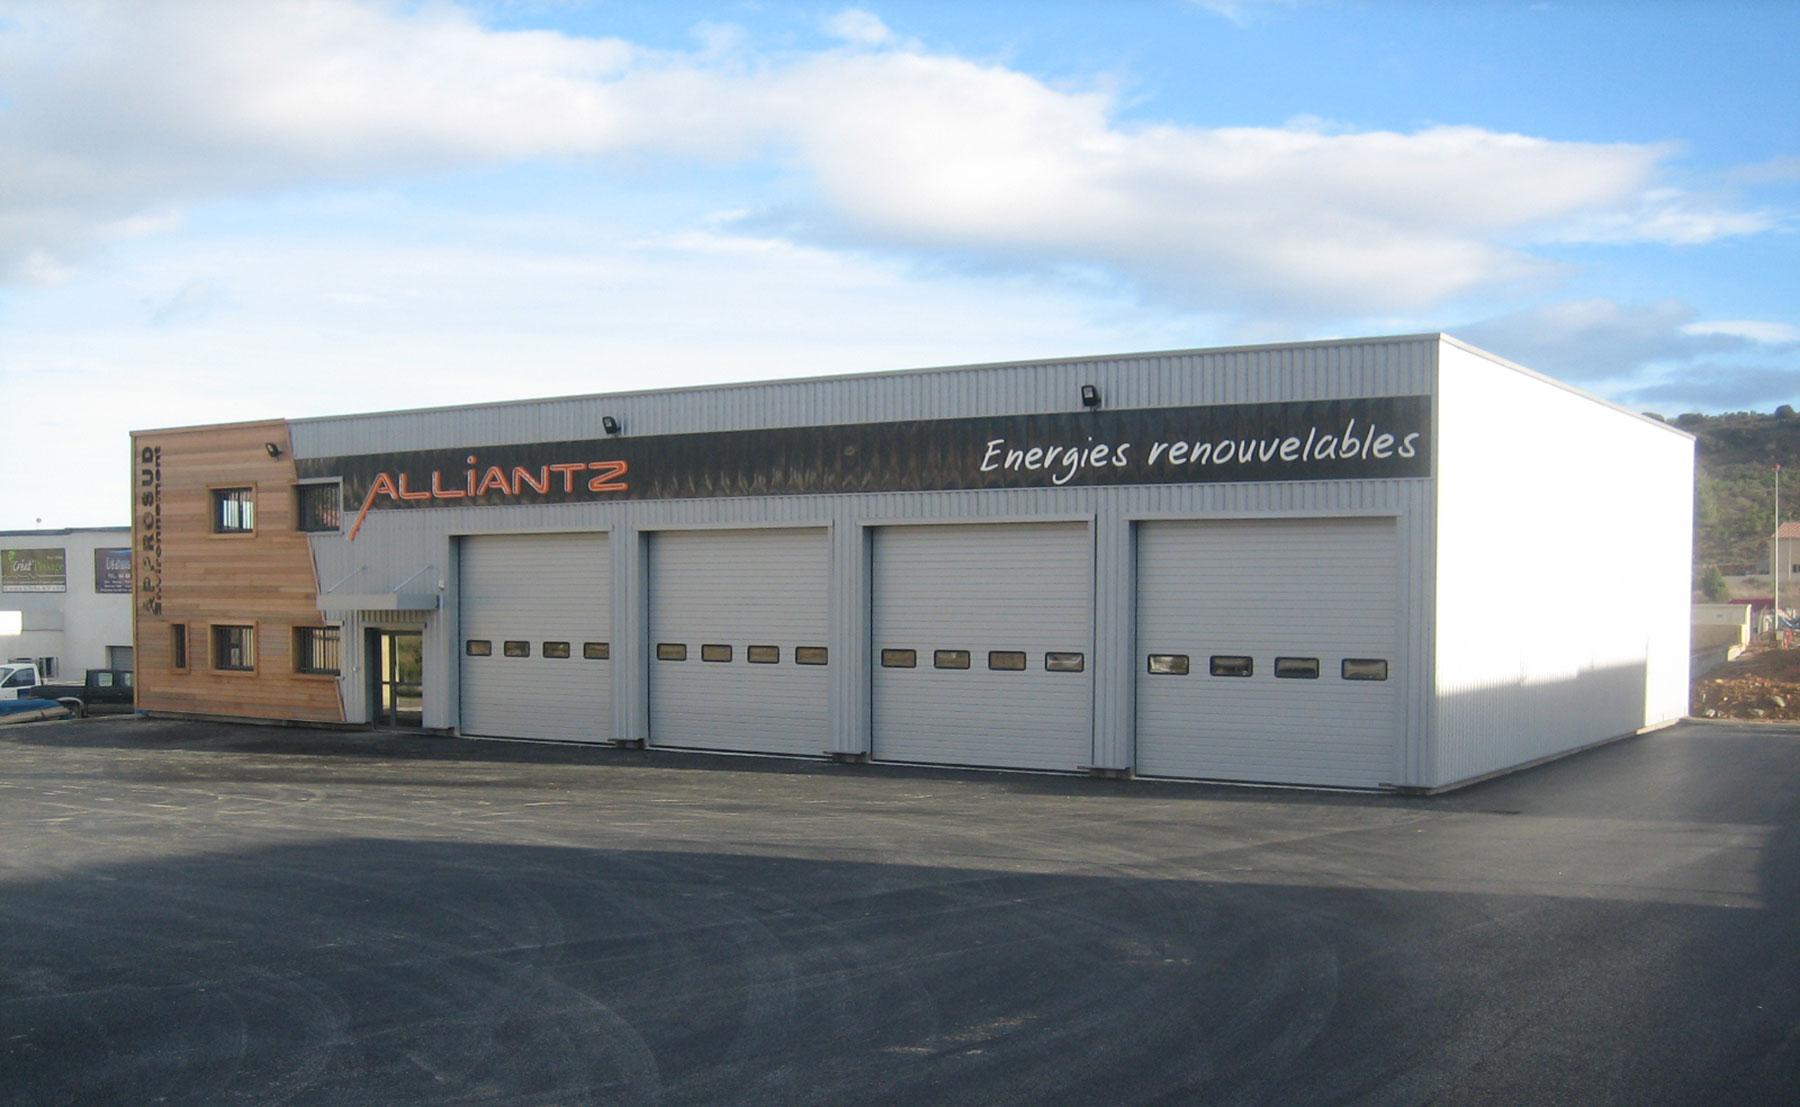 Entrepôt Alliantz - Bâtiment industriel